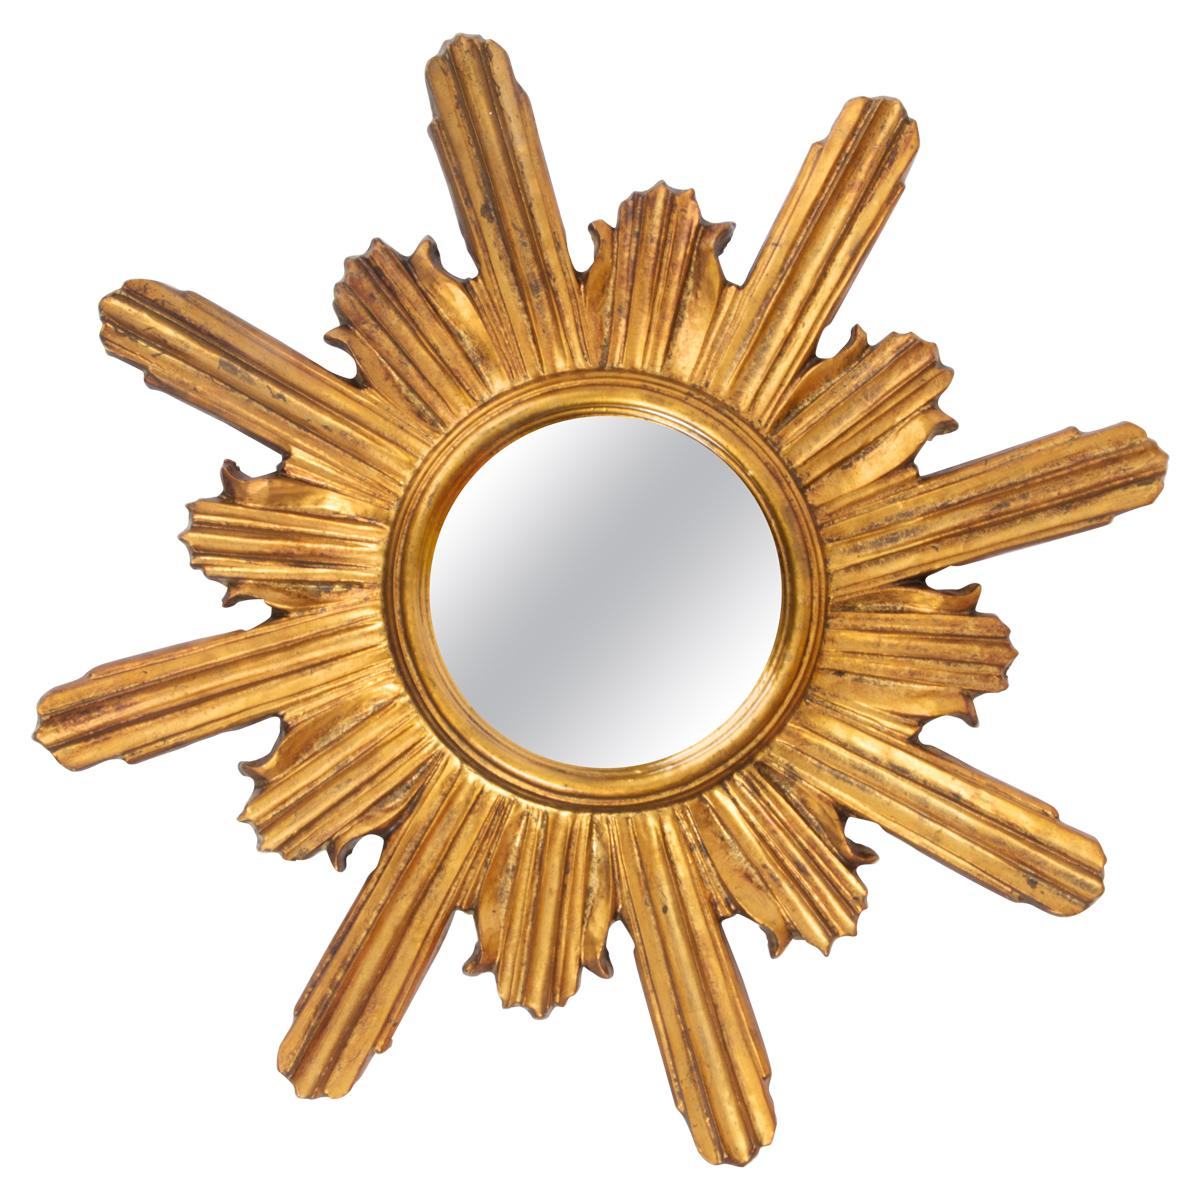 20th Century Modern Gold Italian Sunburst Mirror, Giltwood, 1960s